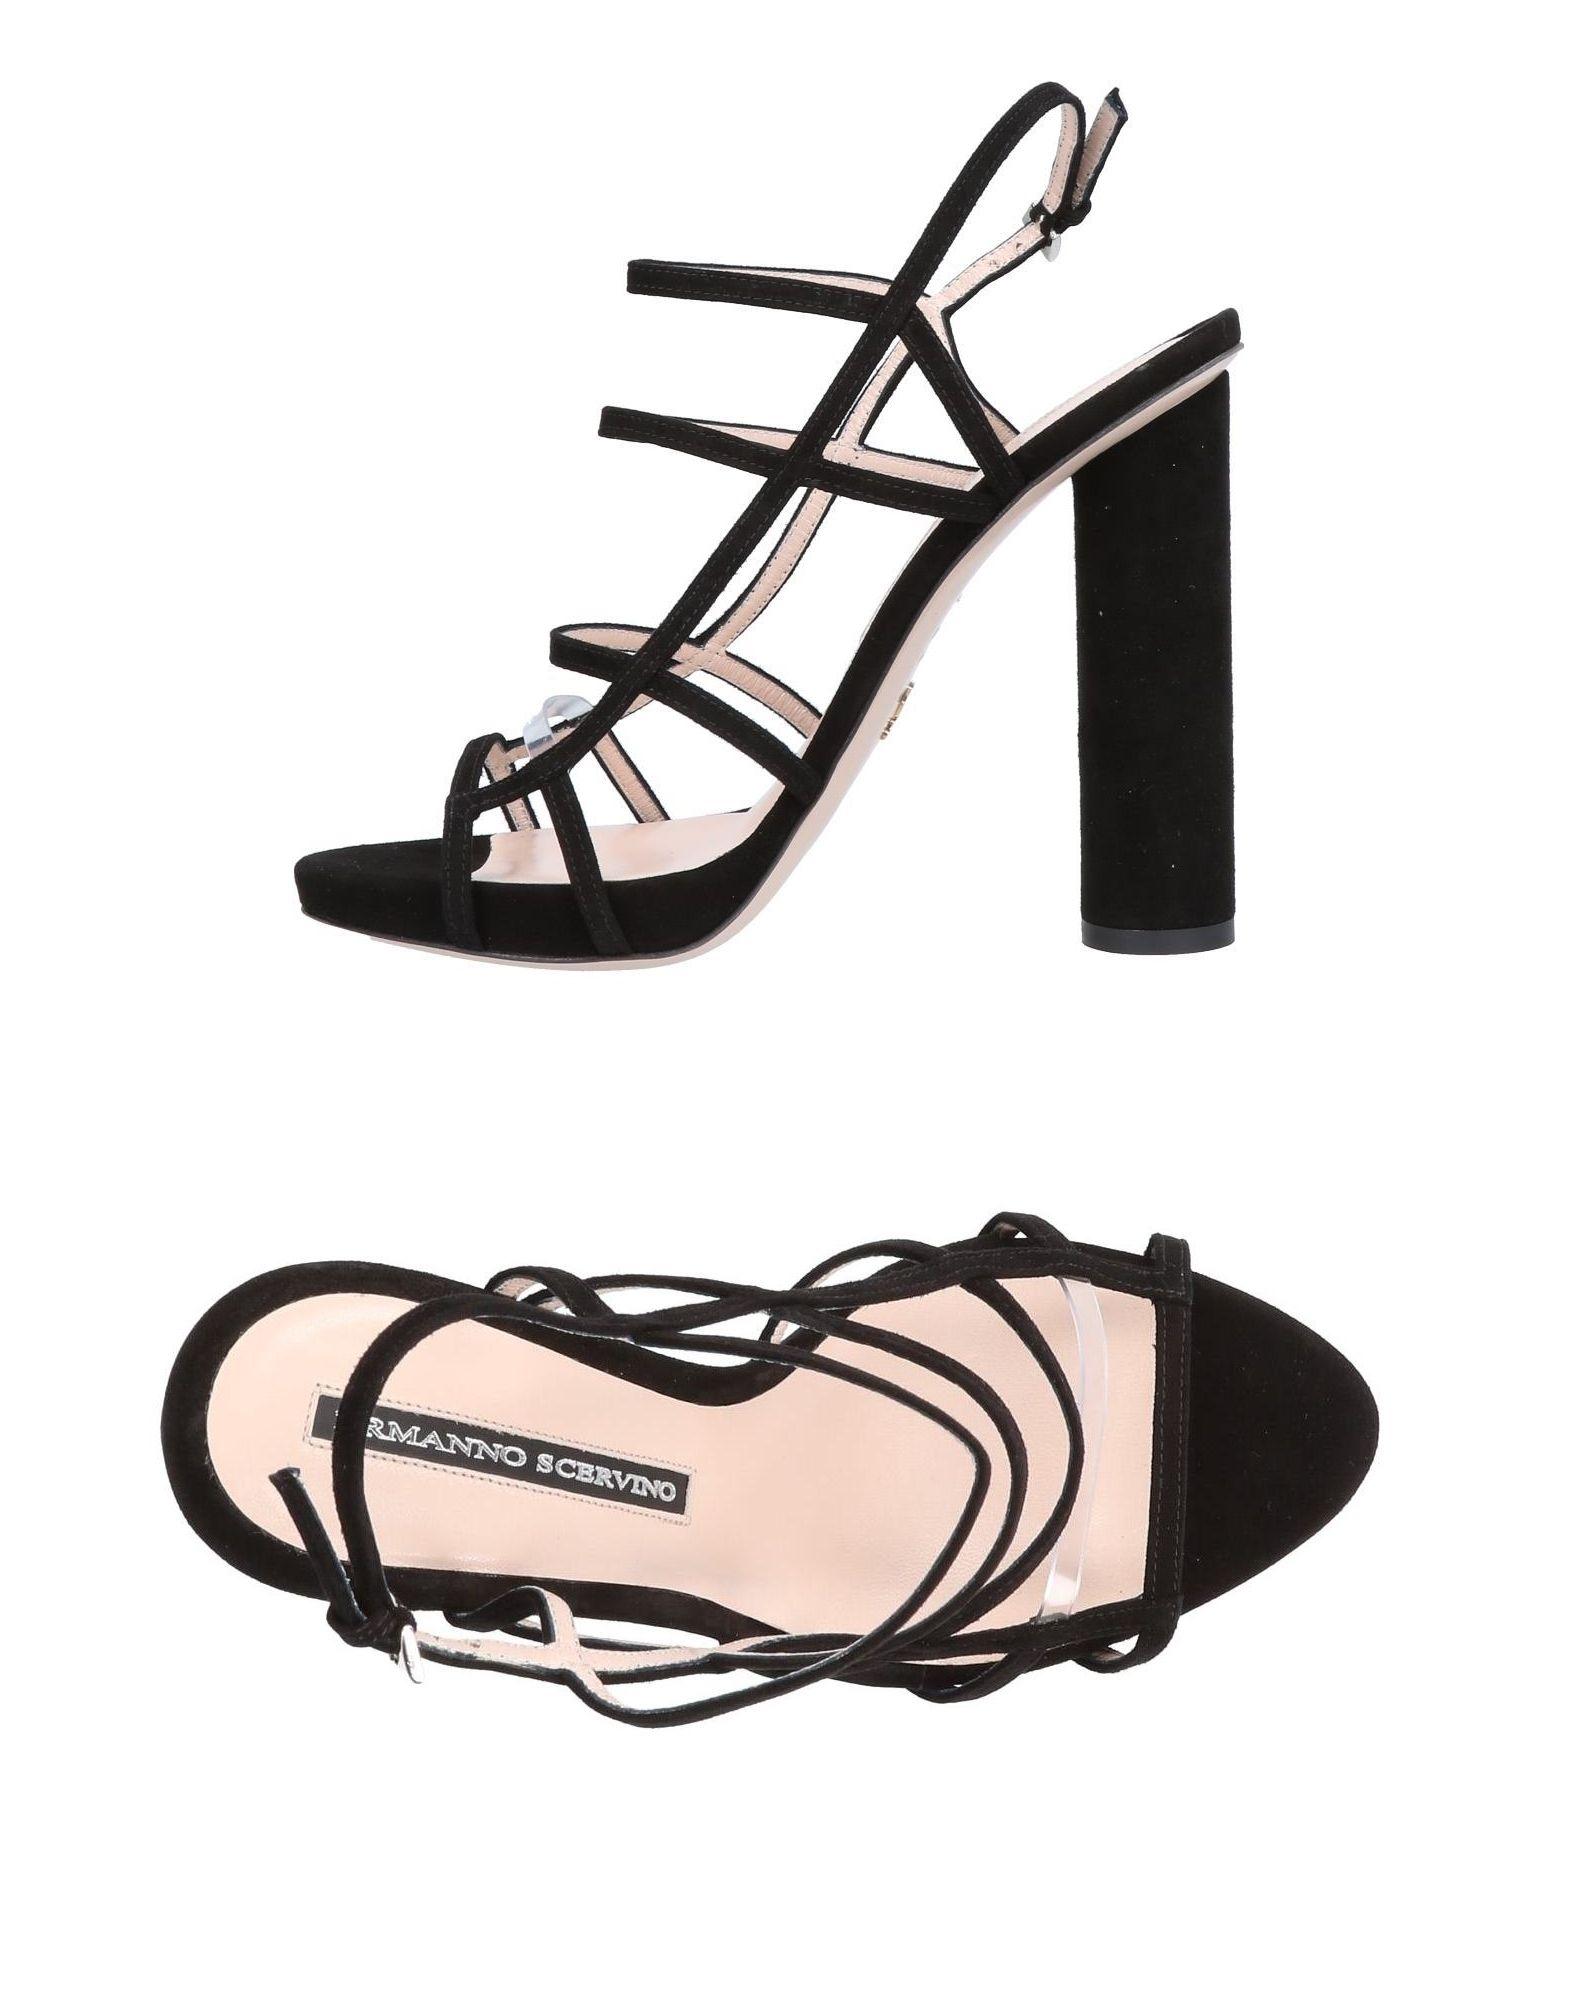 Stilvolle billige Schuhe Ermanno Scervino Sandalen Damen  11446675KI